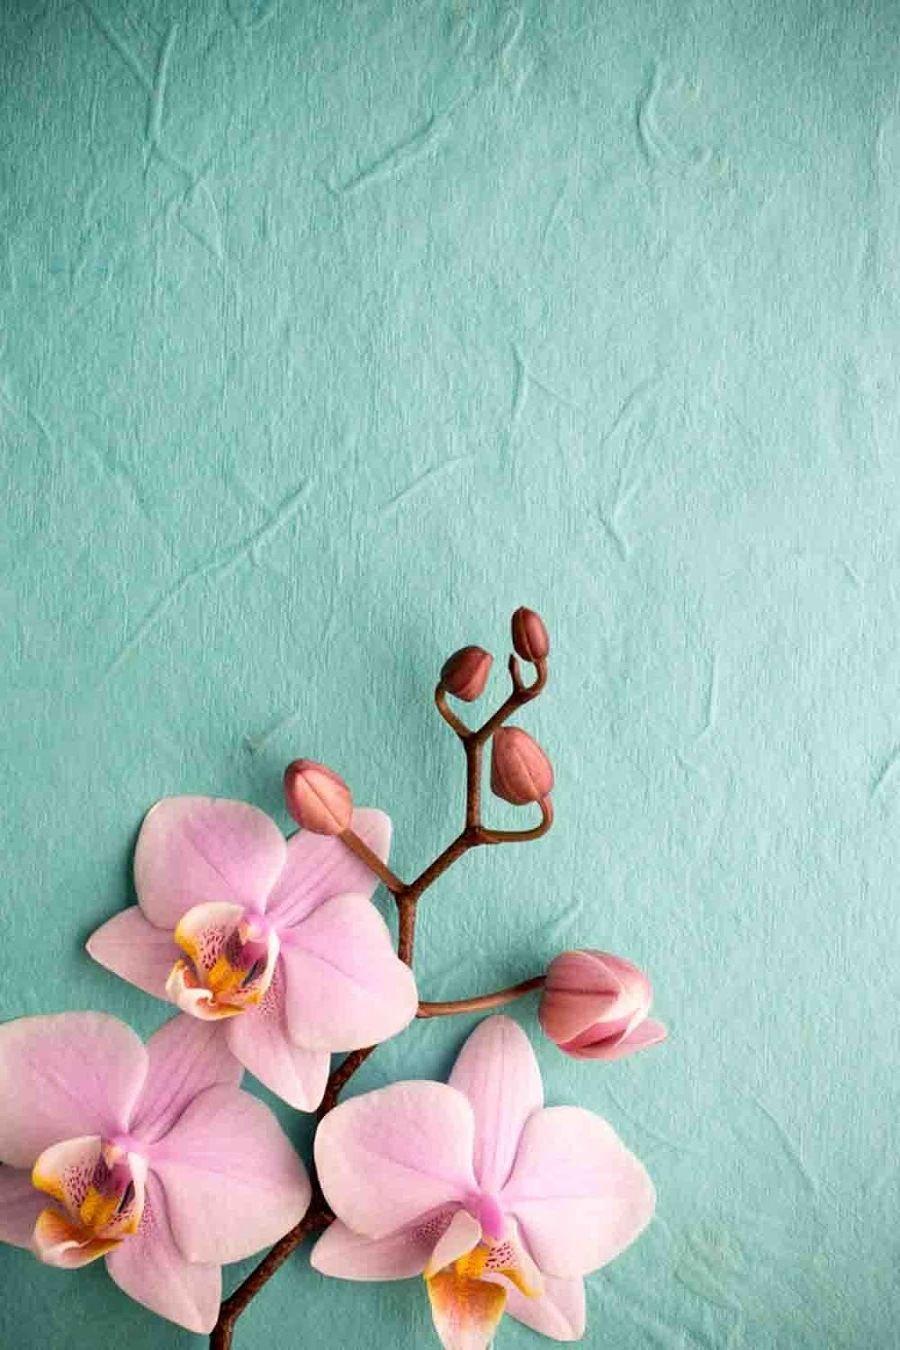 Pink Orchid Wallpaper Iphone Best Iphone Wallpaper Pink Orchid Wallpaper Pink Wallpaper Iphone Orchid Wallpaper